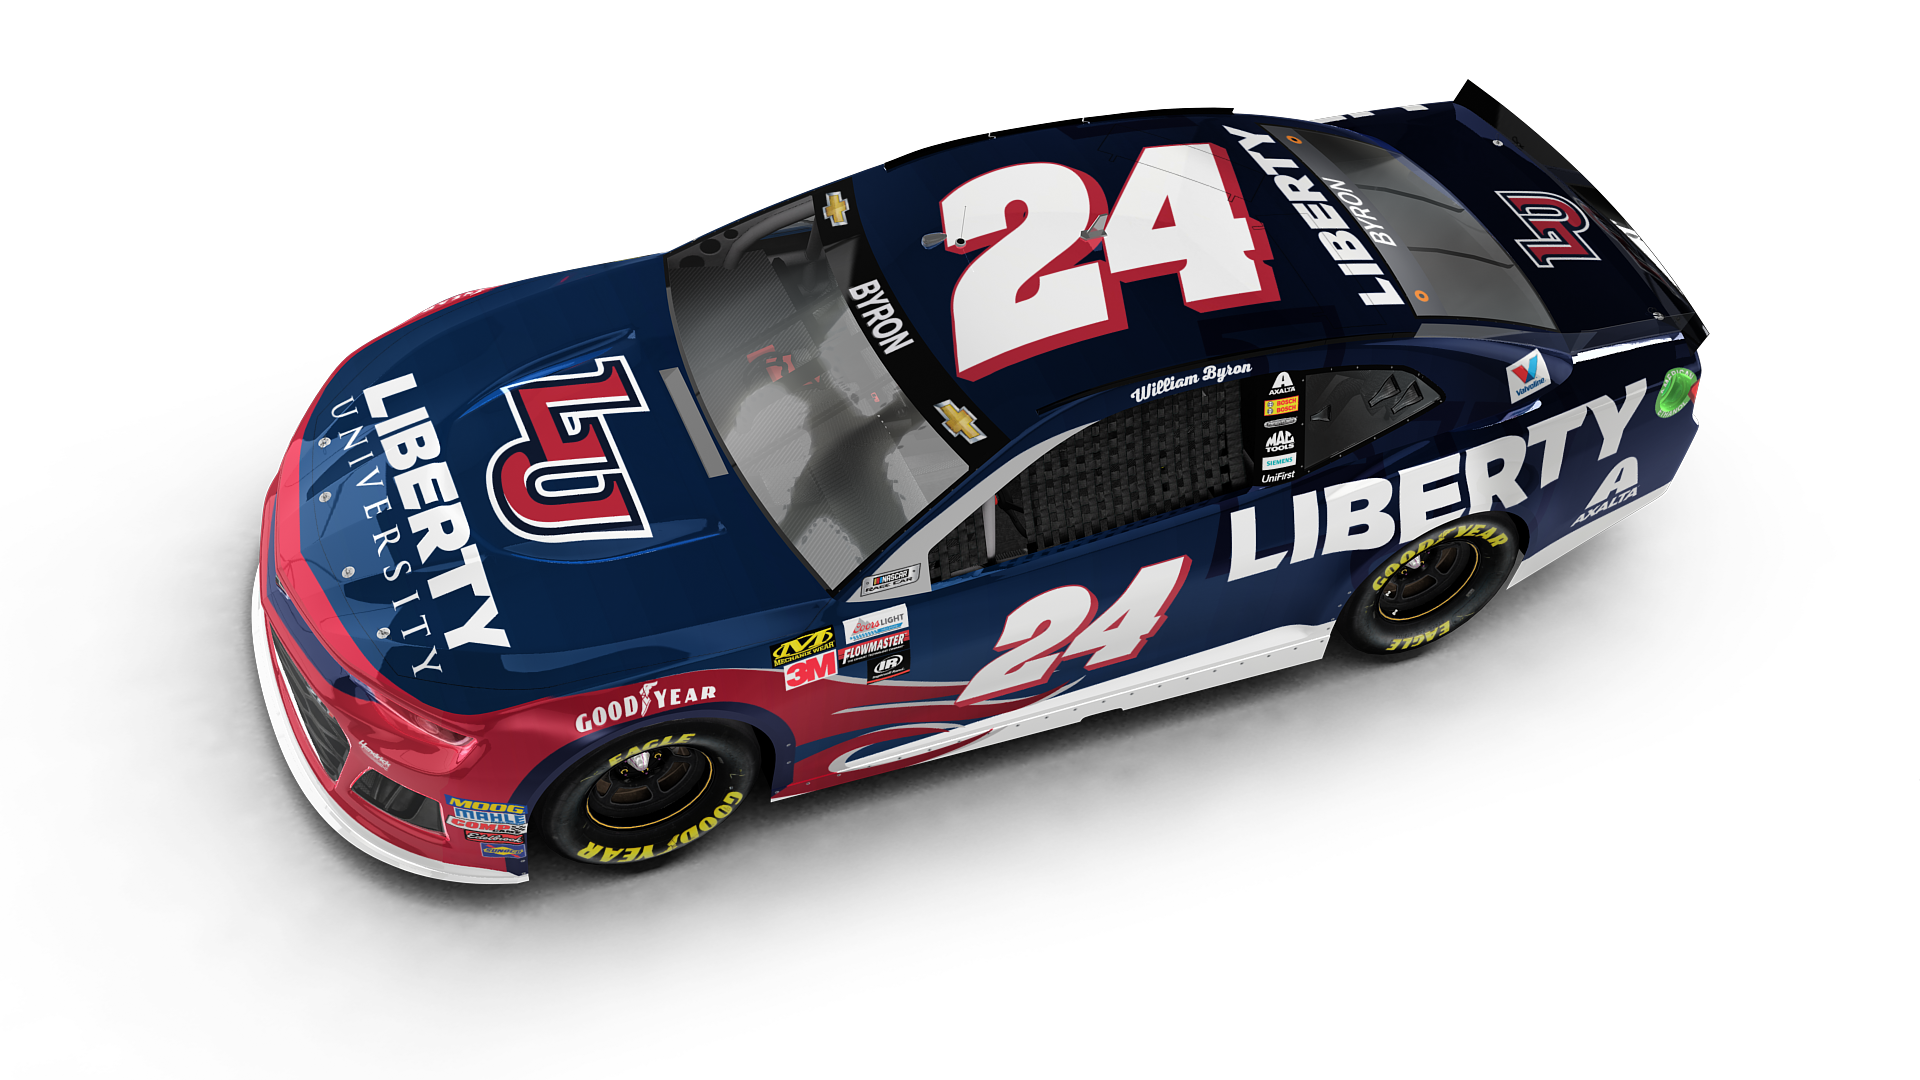 Byron's Liberty University scheme gets an update | Hendrick Motorsports